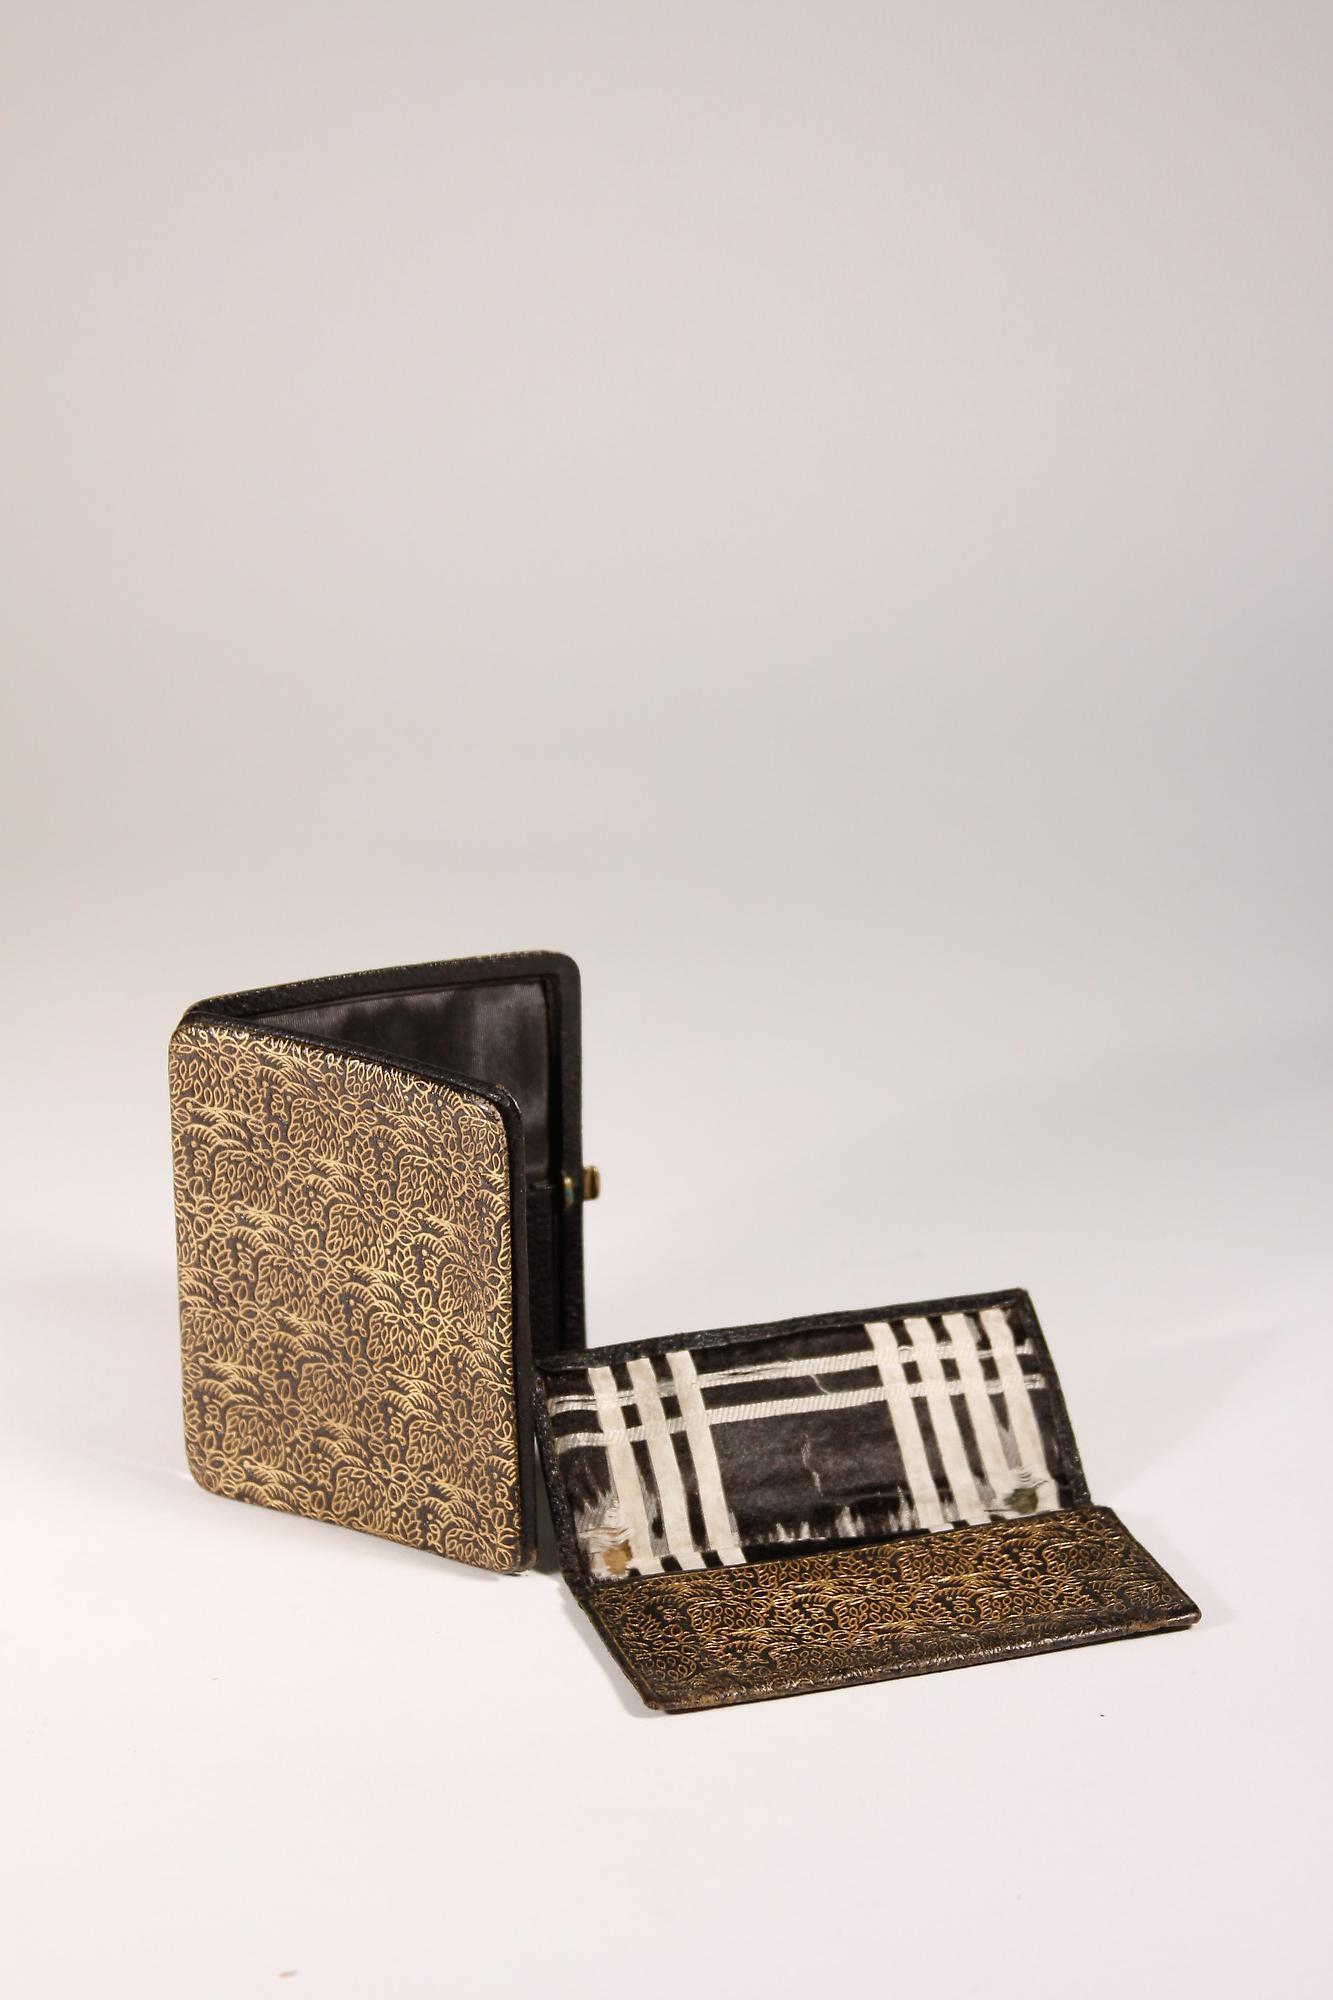 Dagobert Peche Leather Cigarette Case and Card Holder 1